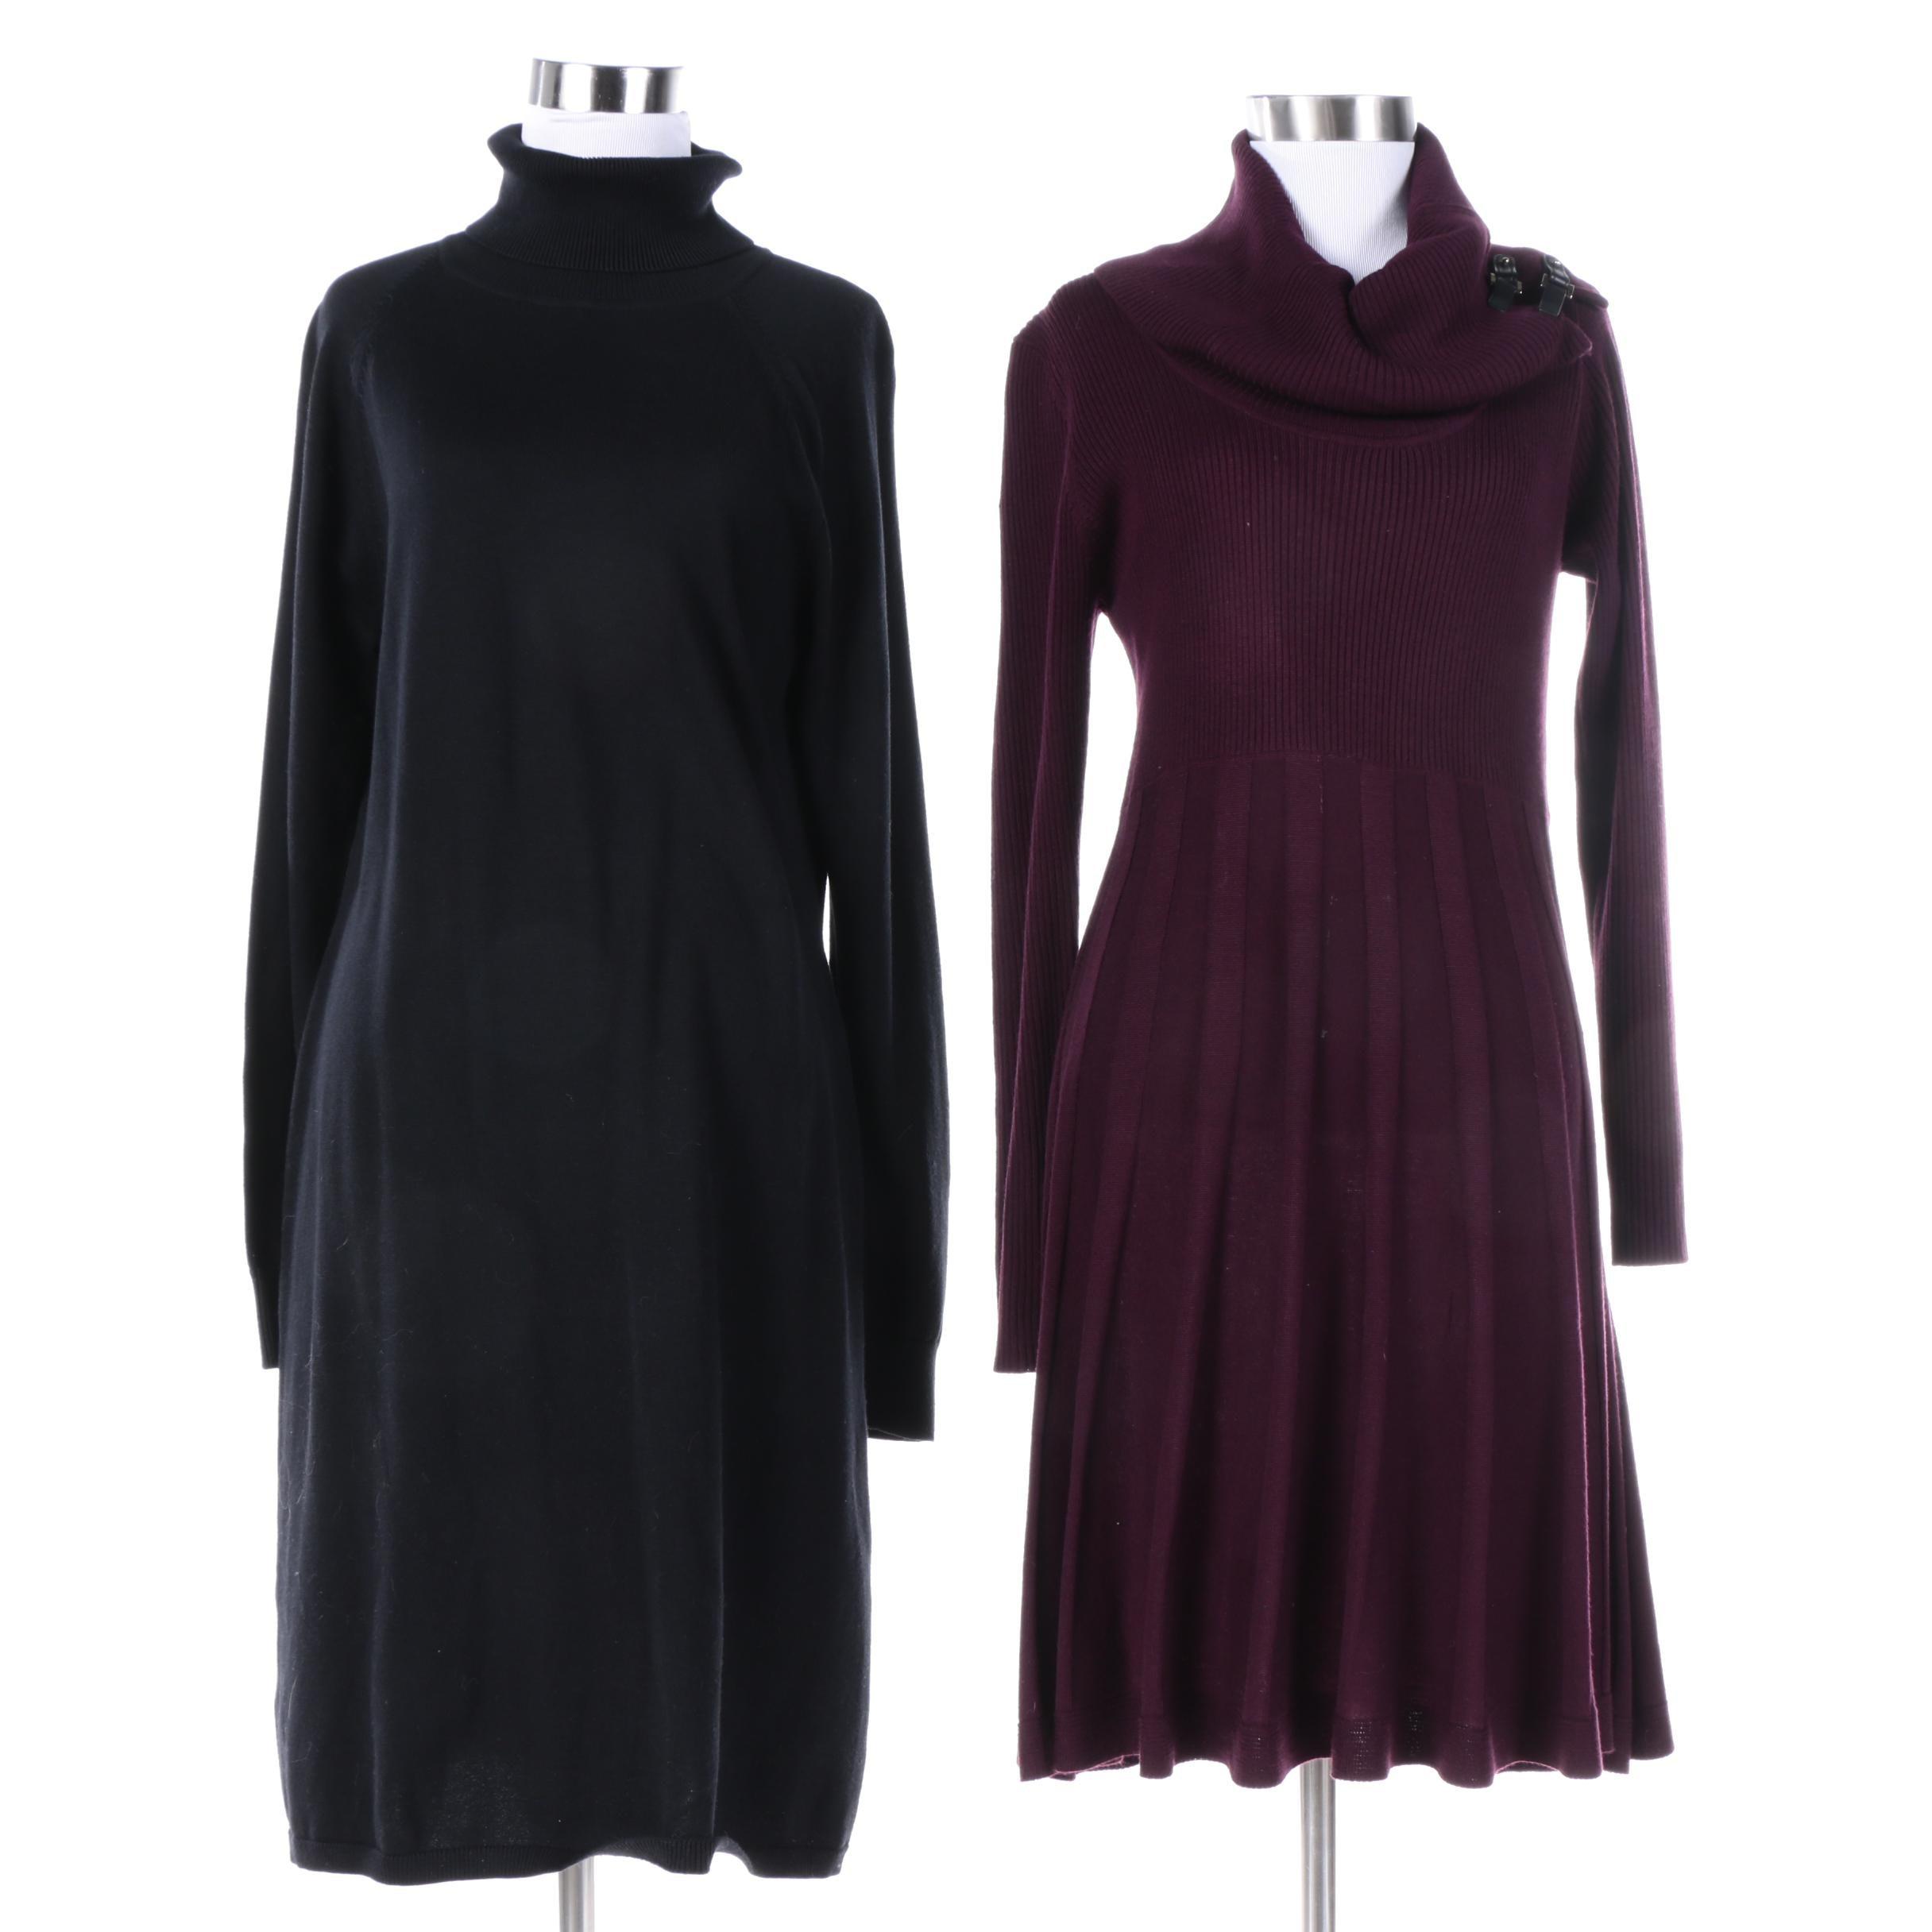 Chaps and Dana Buchman Sweater Dresses